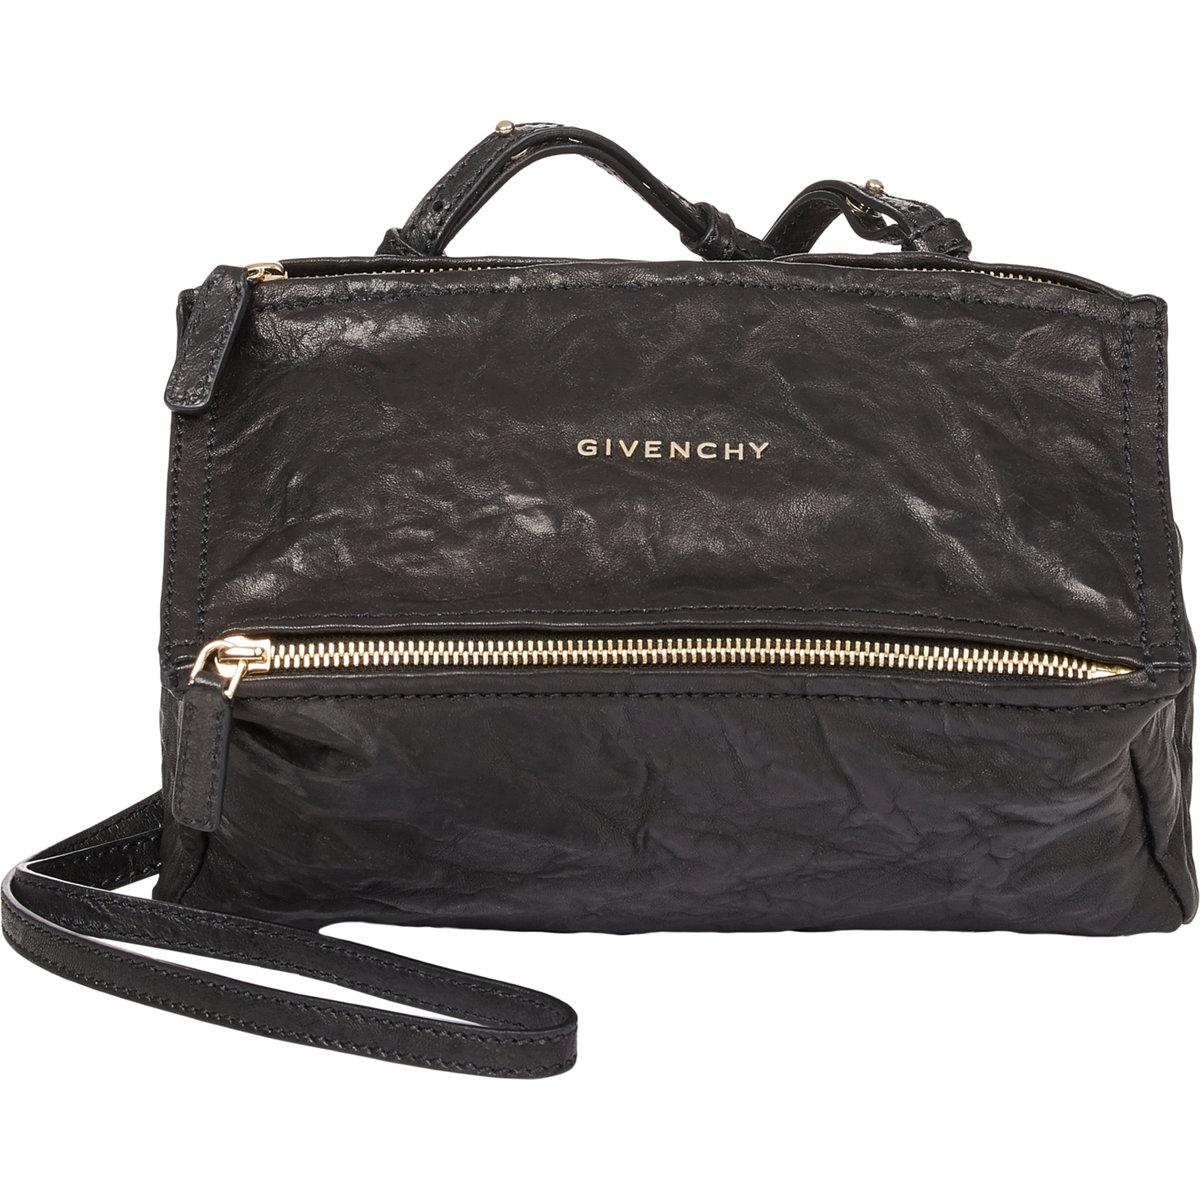 6d43e5c25f49 Lyst - Givenchy Women s Pepe Pandora Mini-messenger in Black